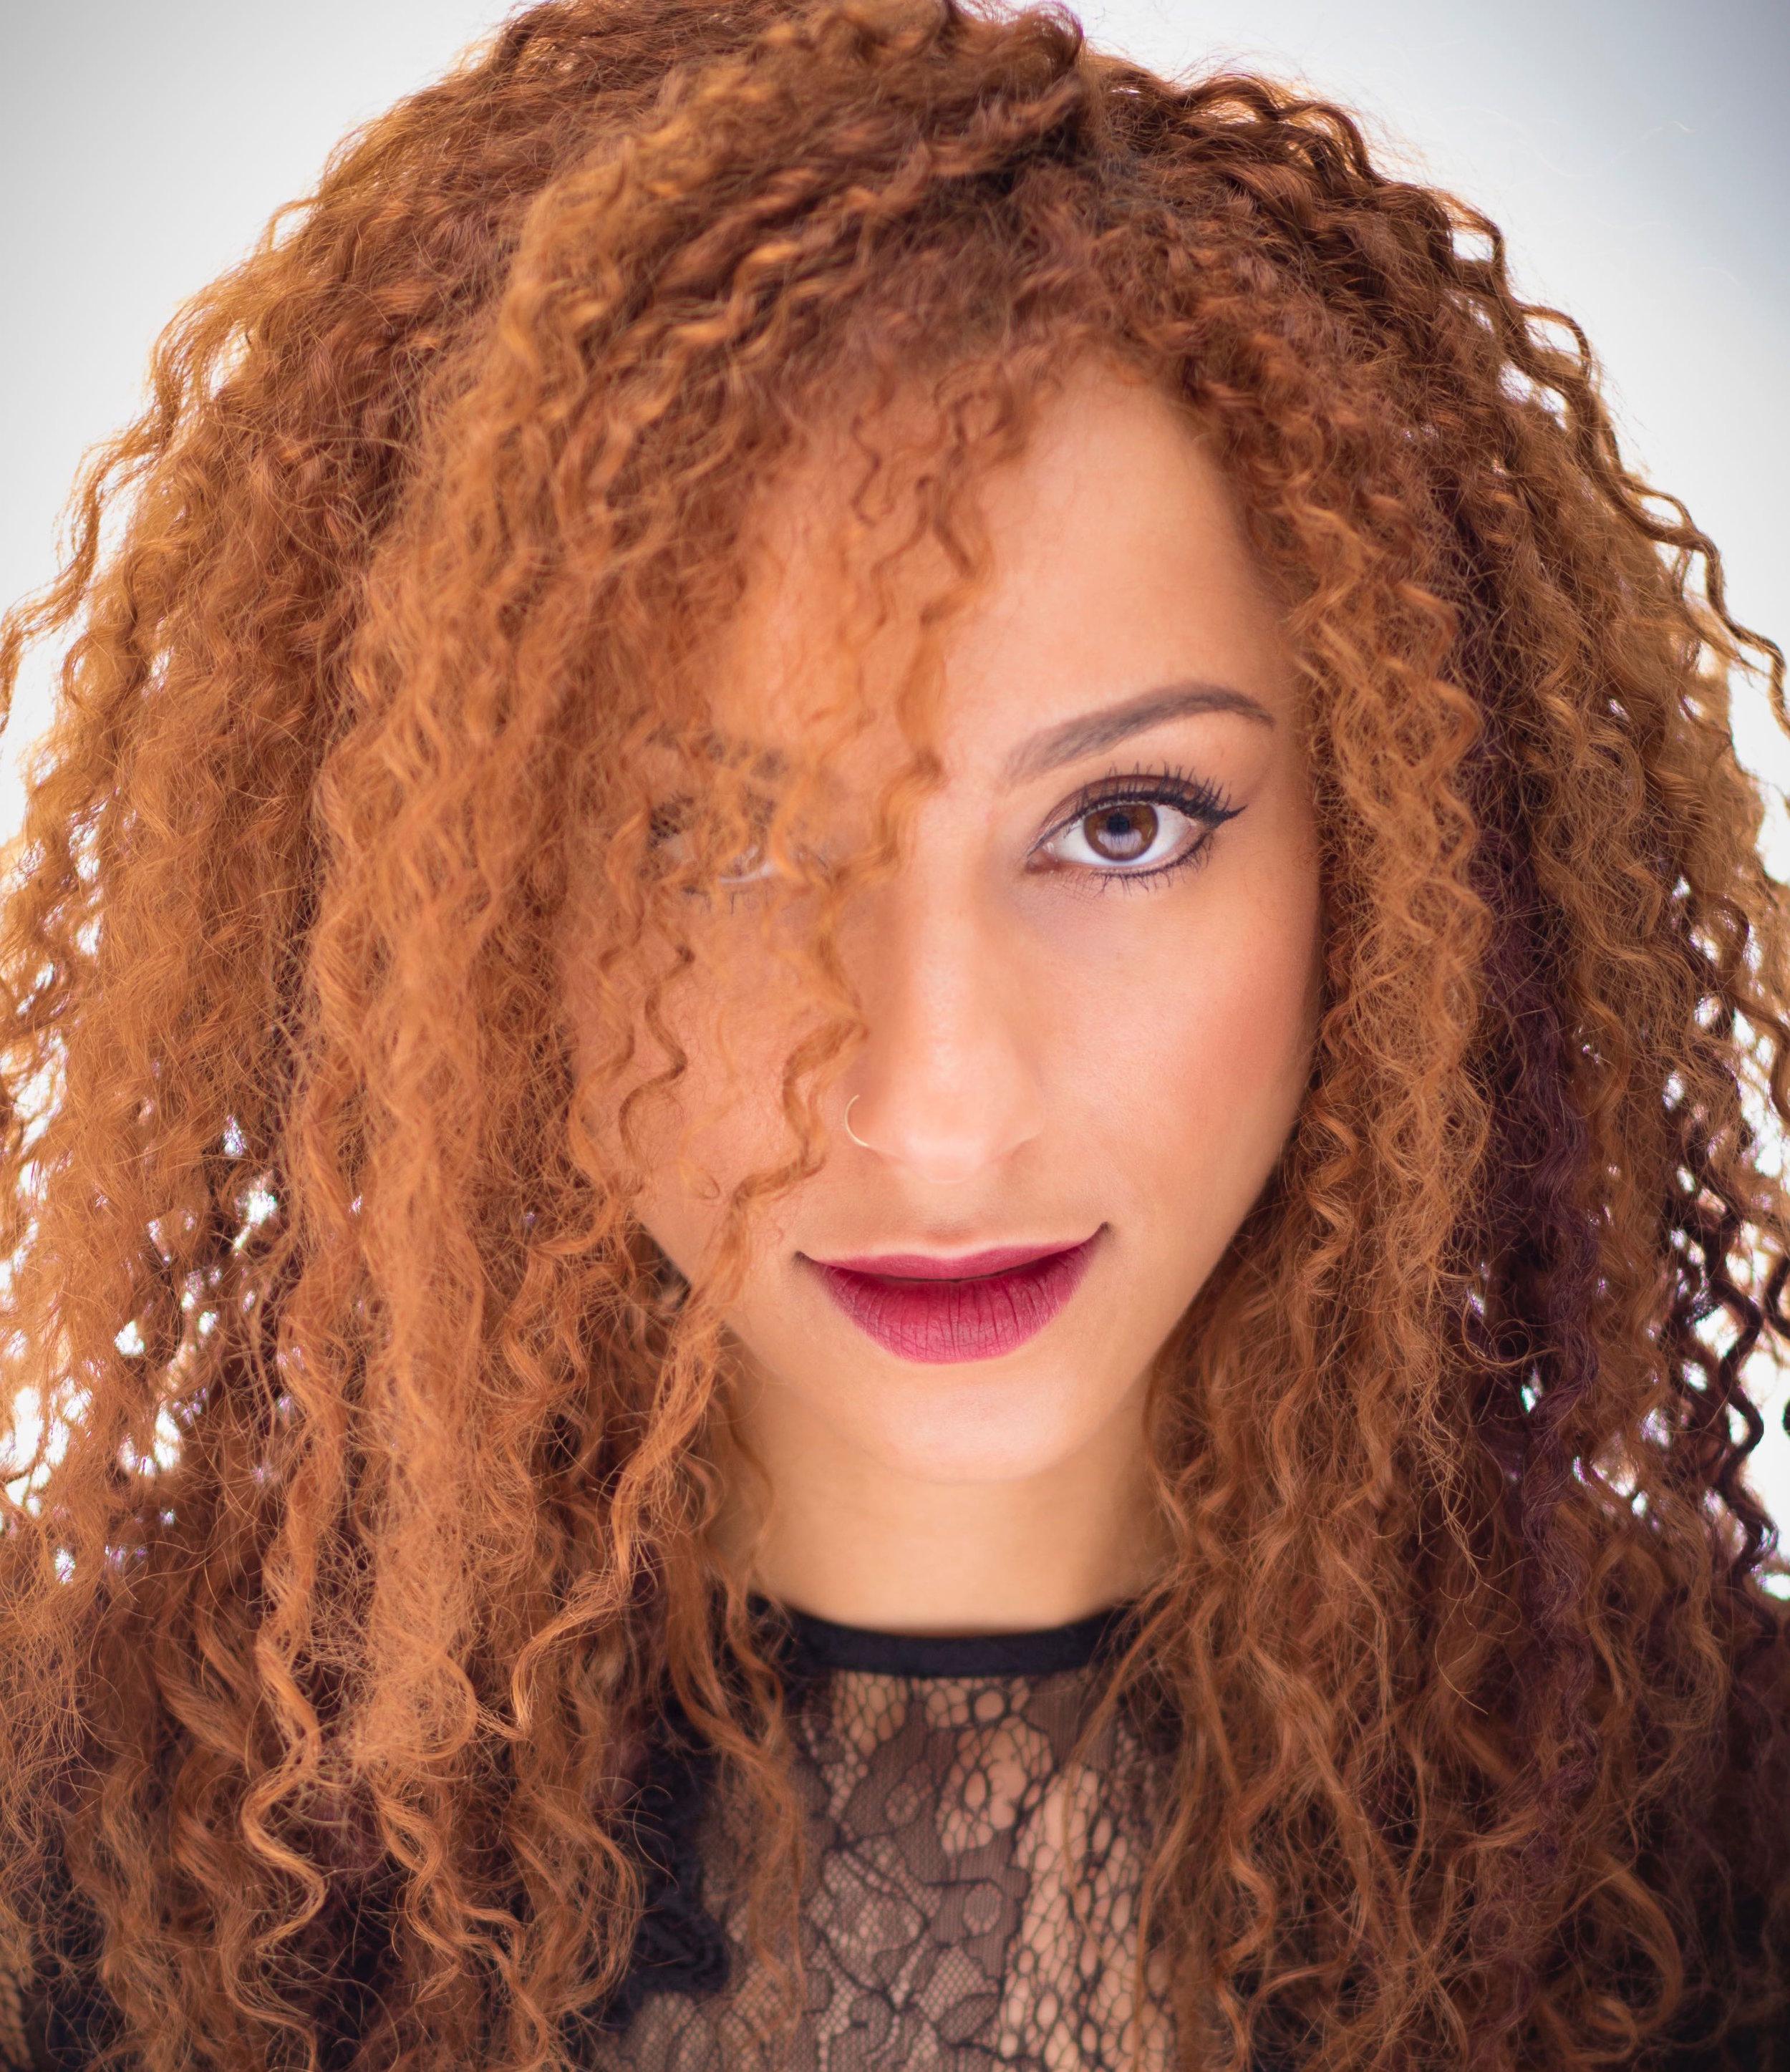 Jasmin head shot.jpg